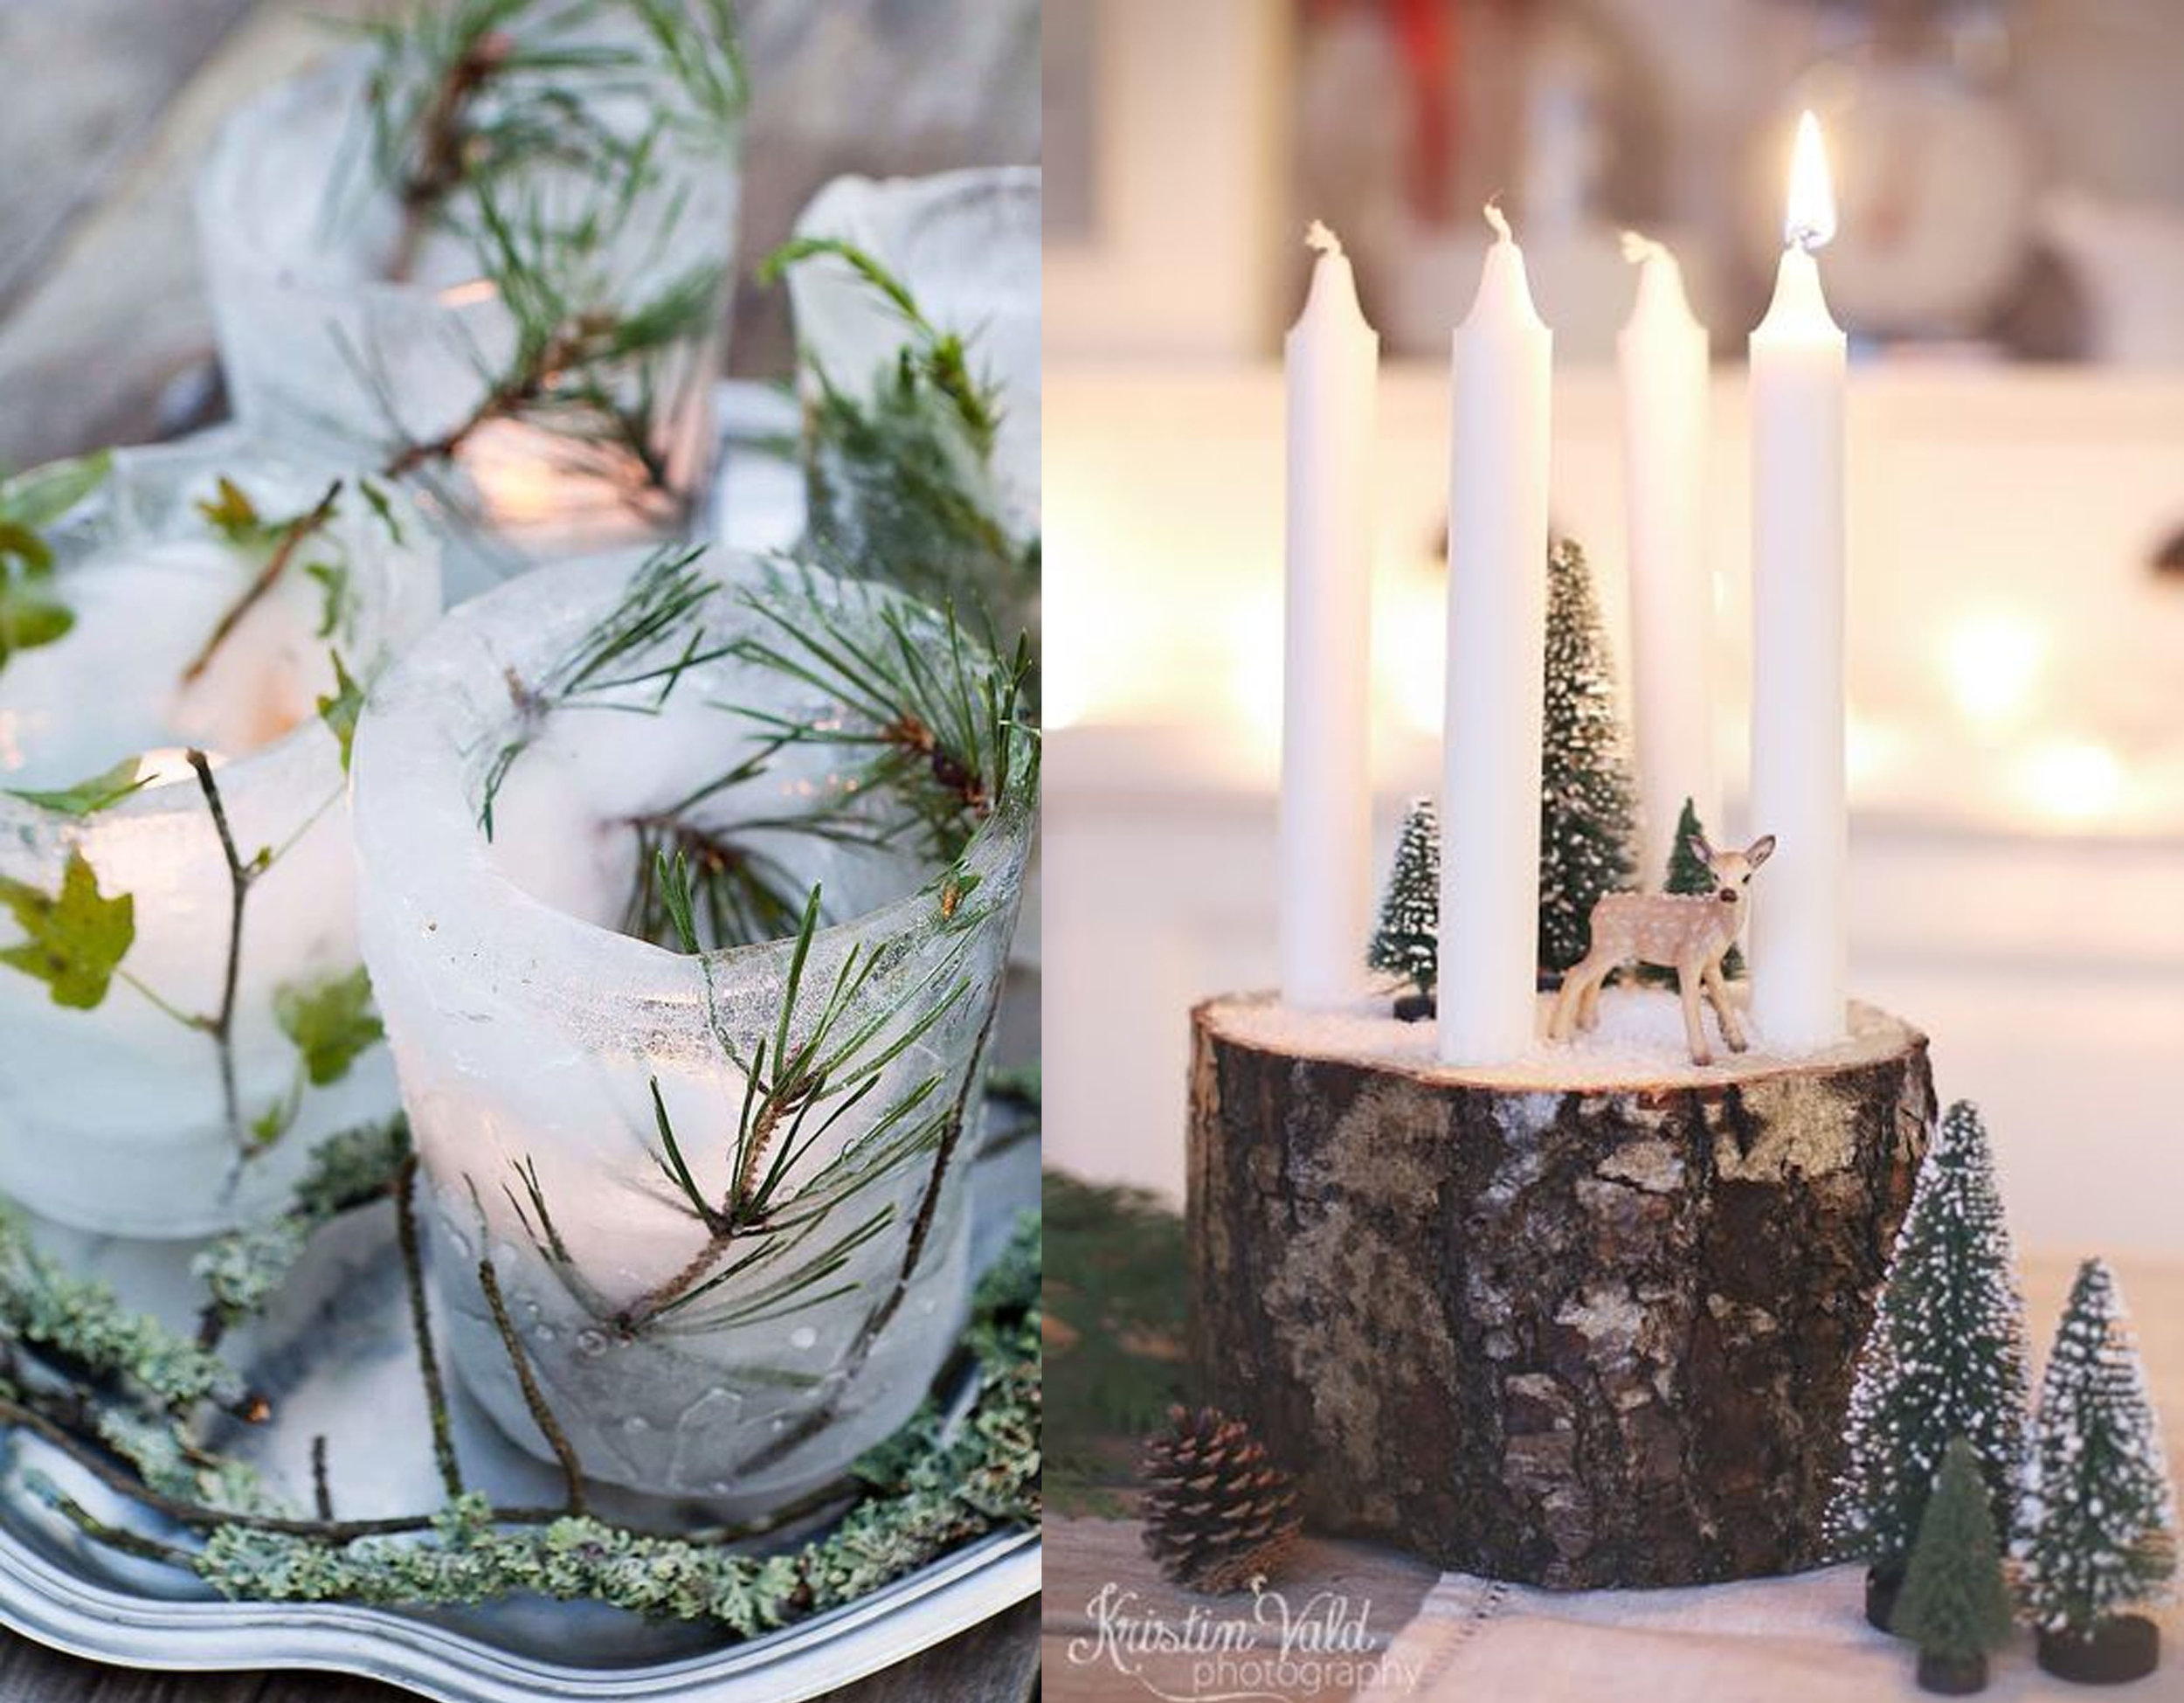 candles in ice via  Idei-Dekoru  - candles on wood base via  Kristin Vald